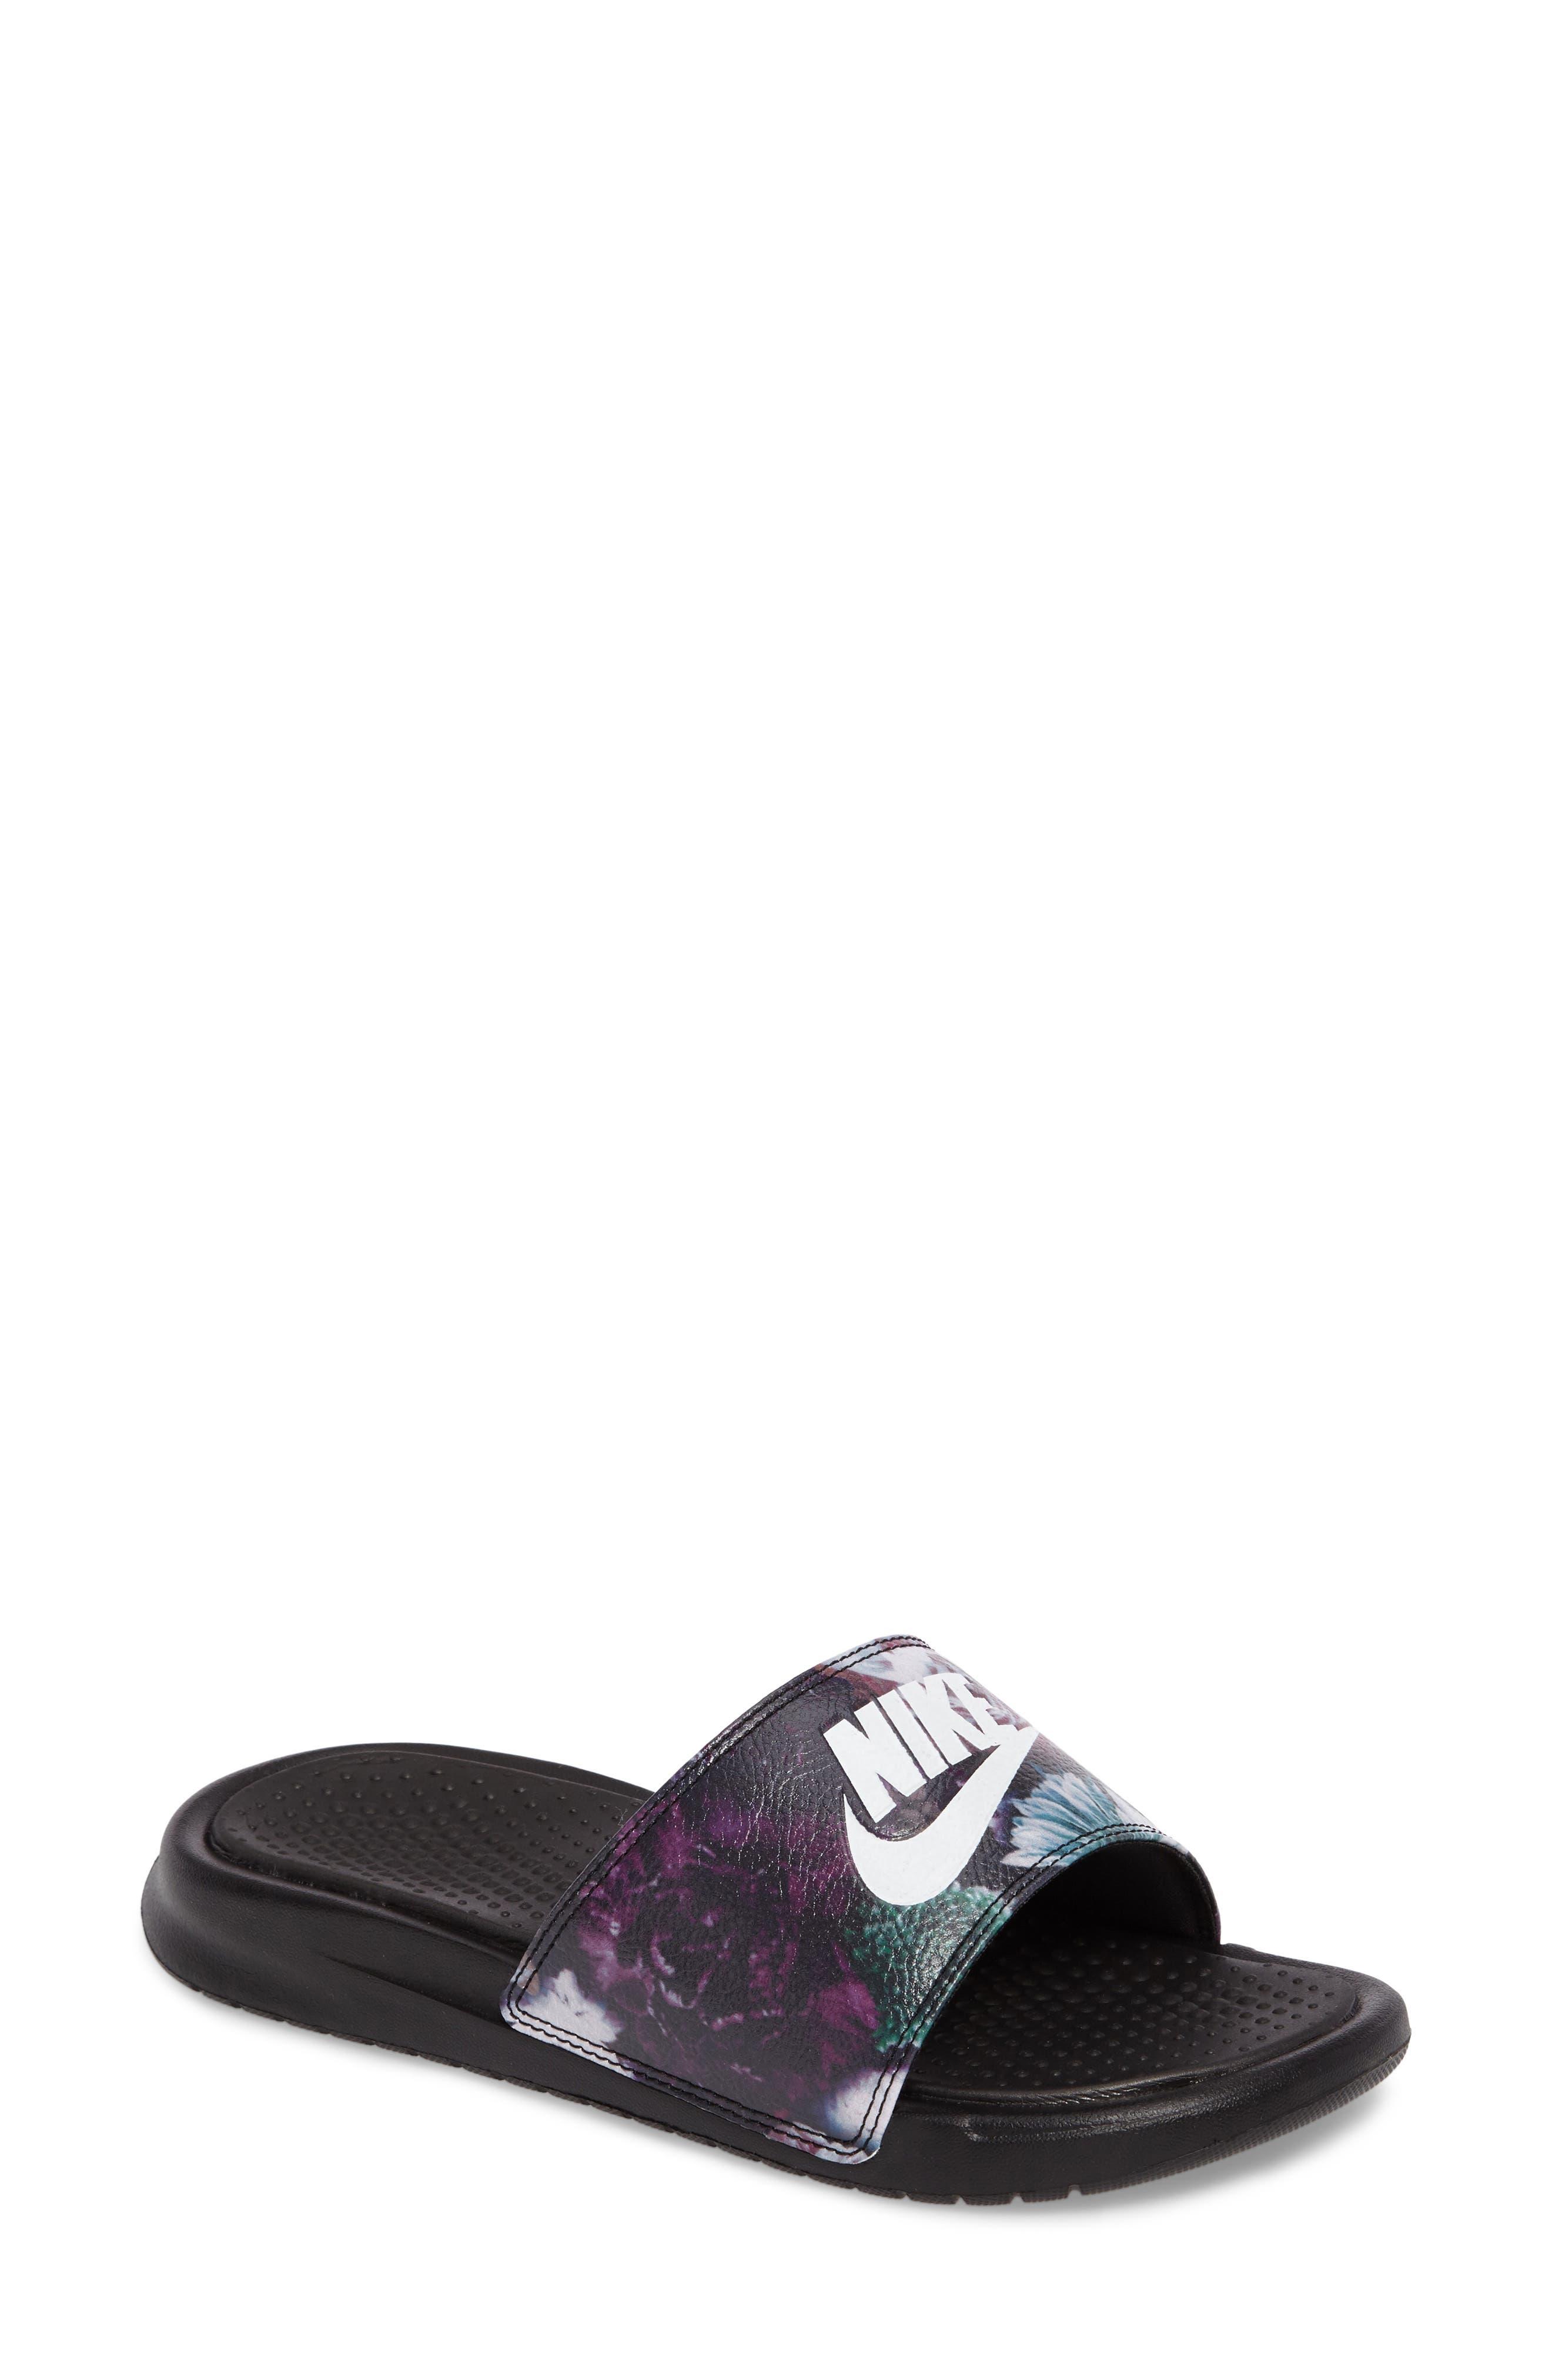 Main Image - Nike 'Benassi Just Do It Ultra Premium' Slide Sandal (Women)